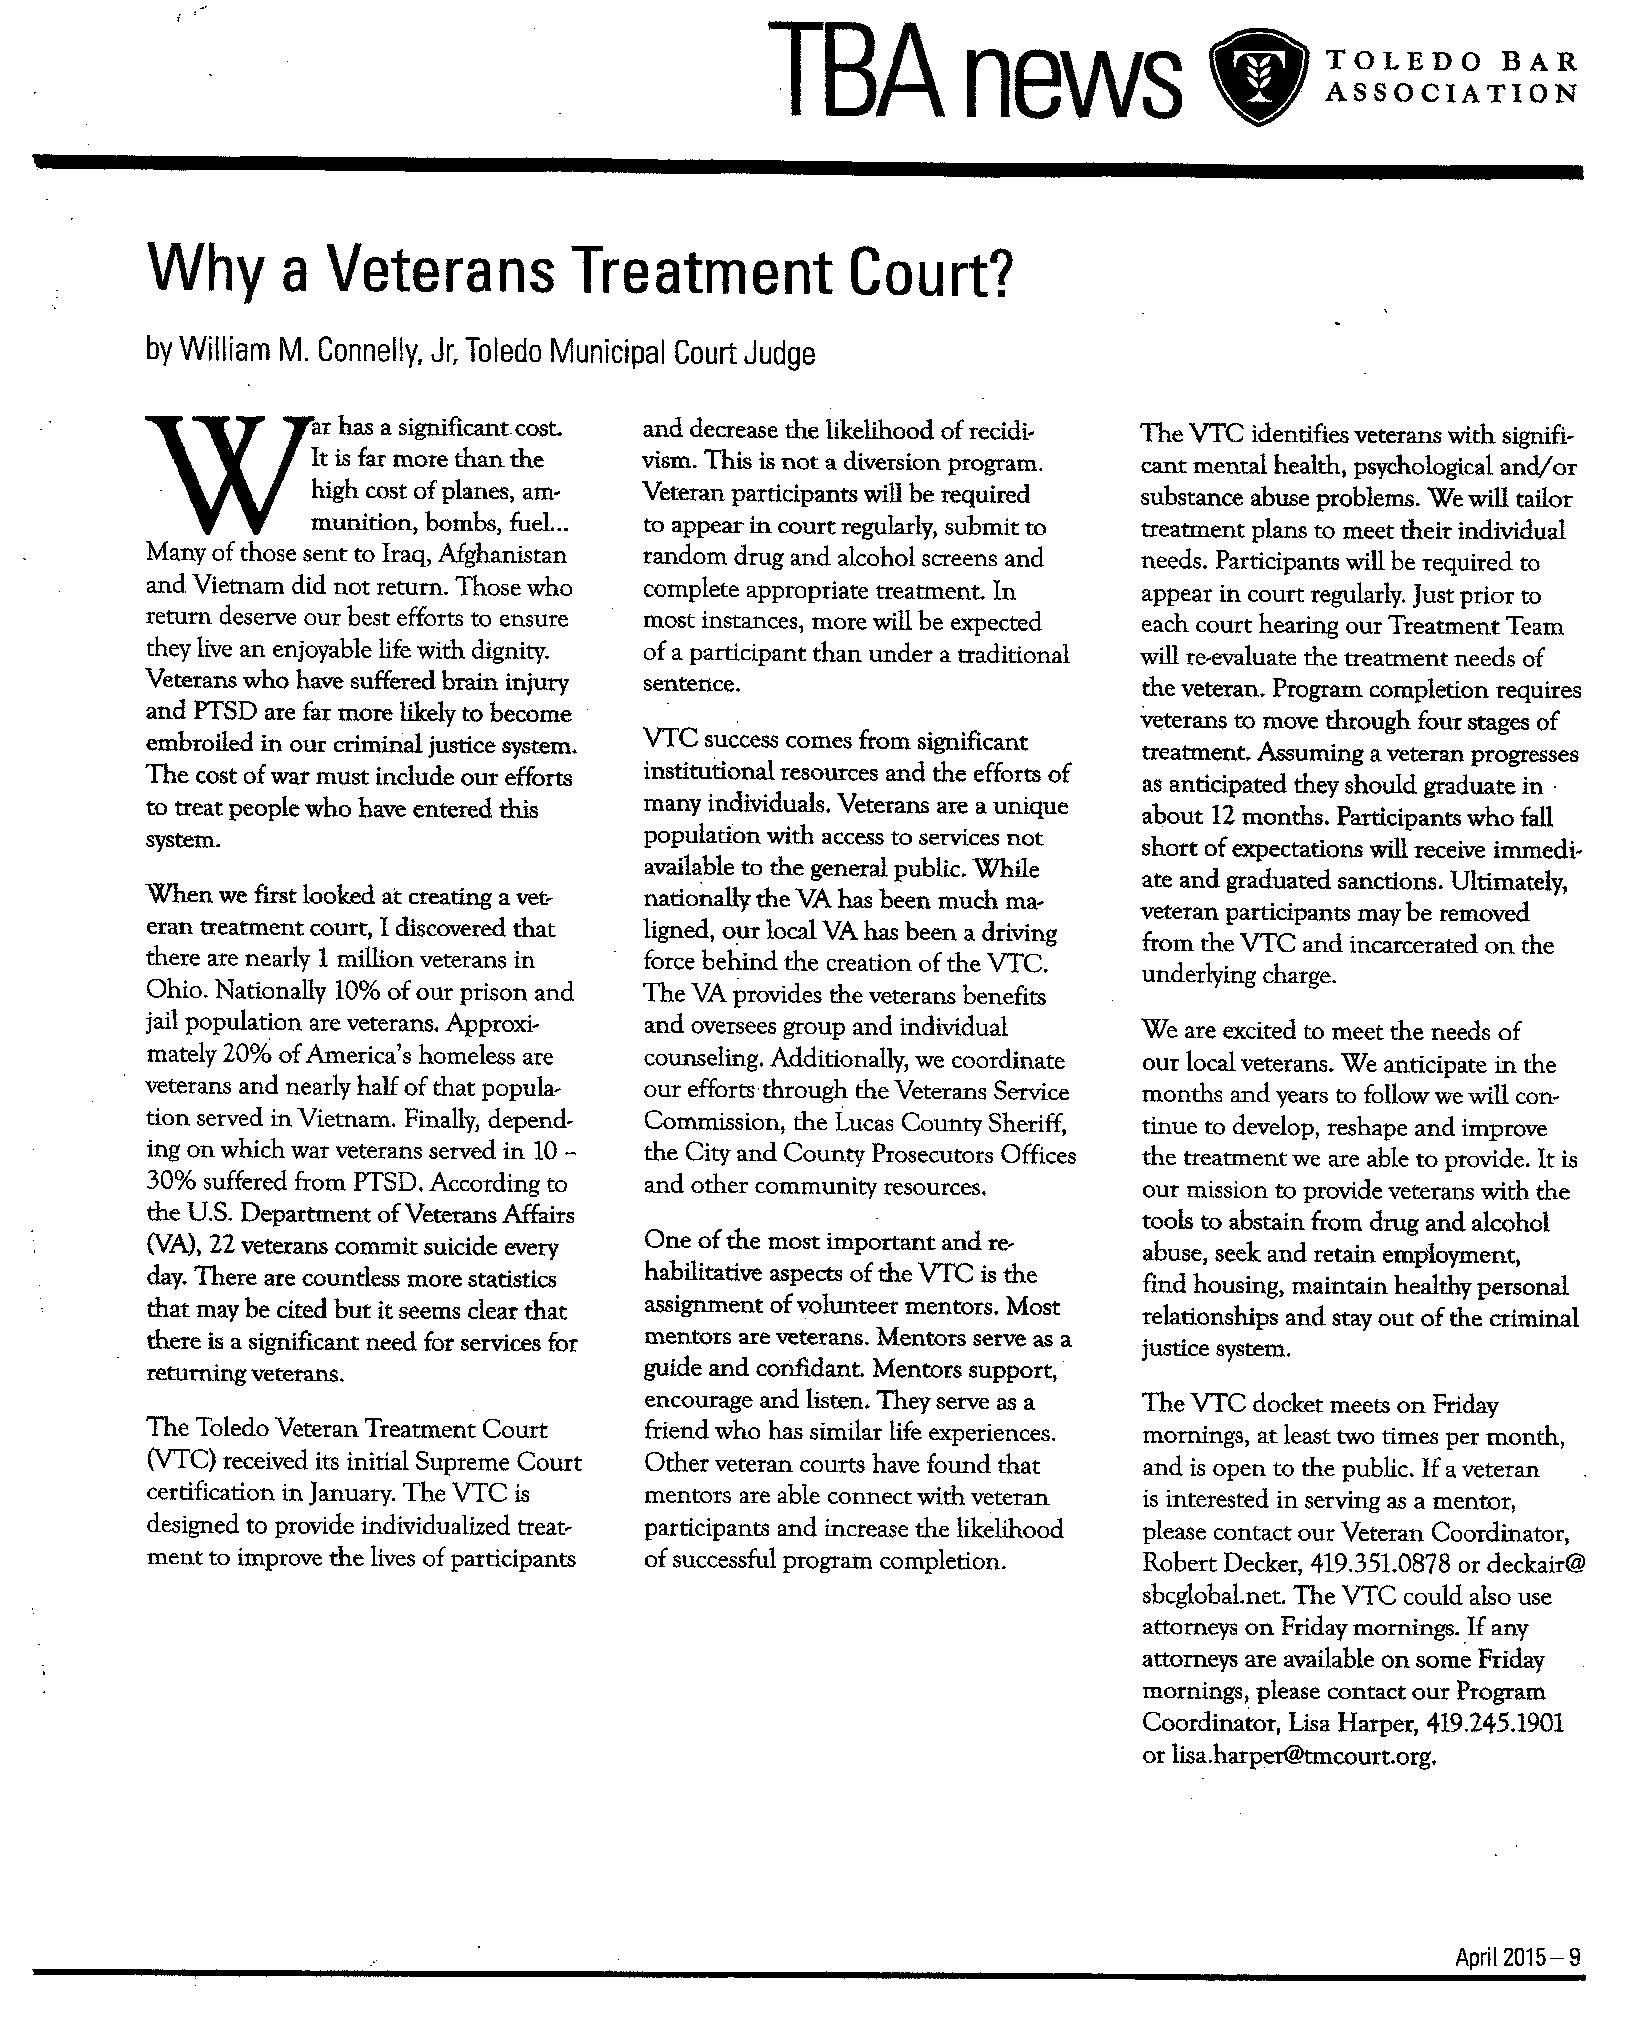 Why a Veterans Treatment Court (Toledo Bar Association